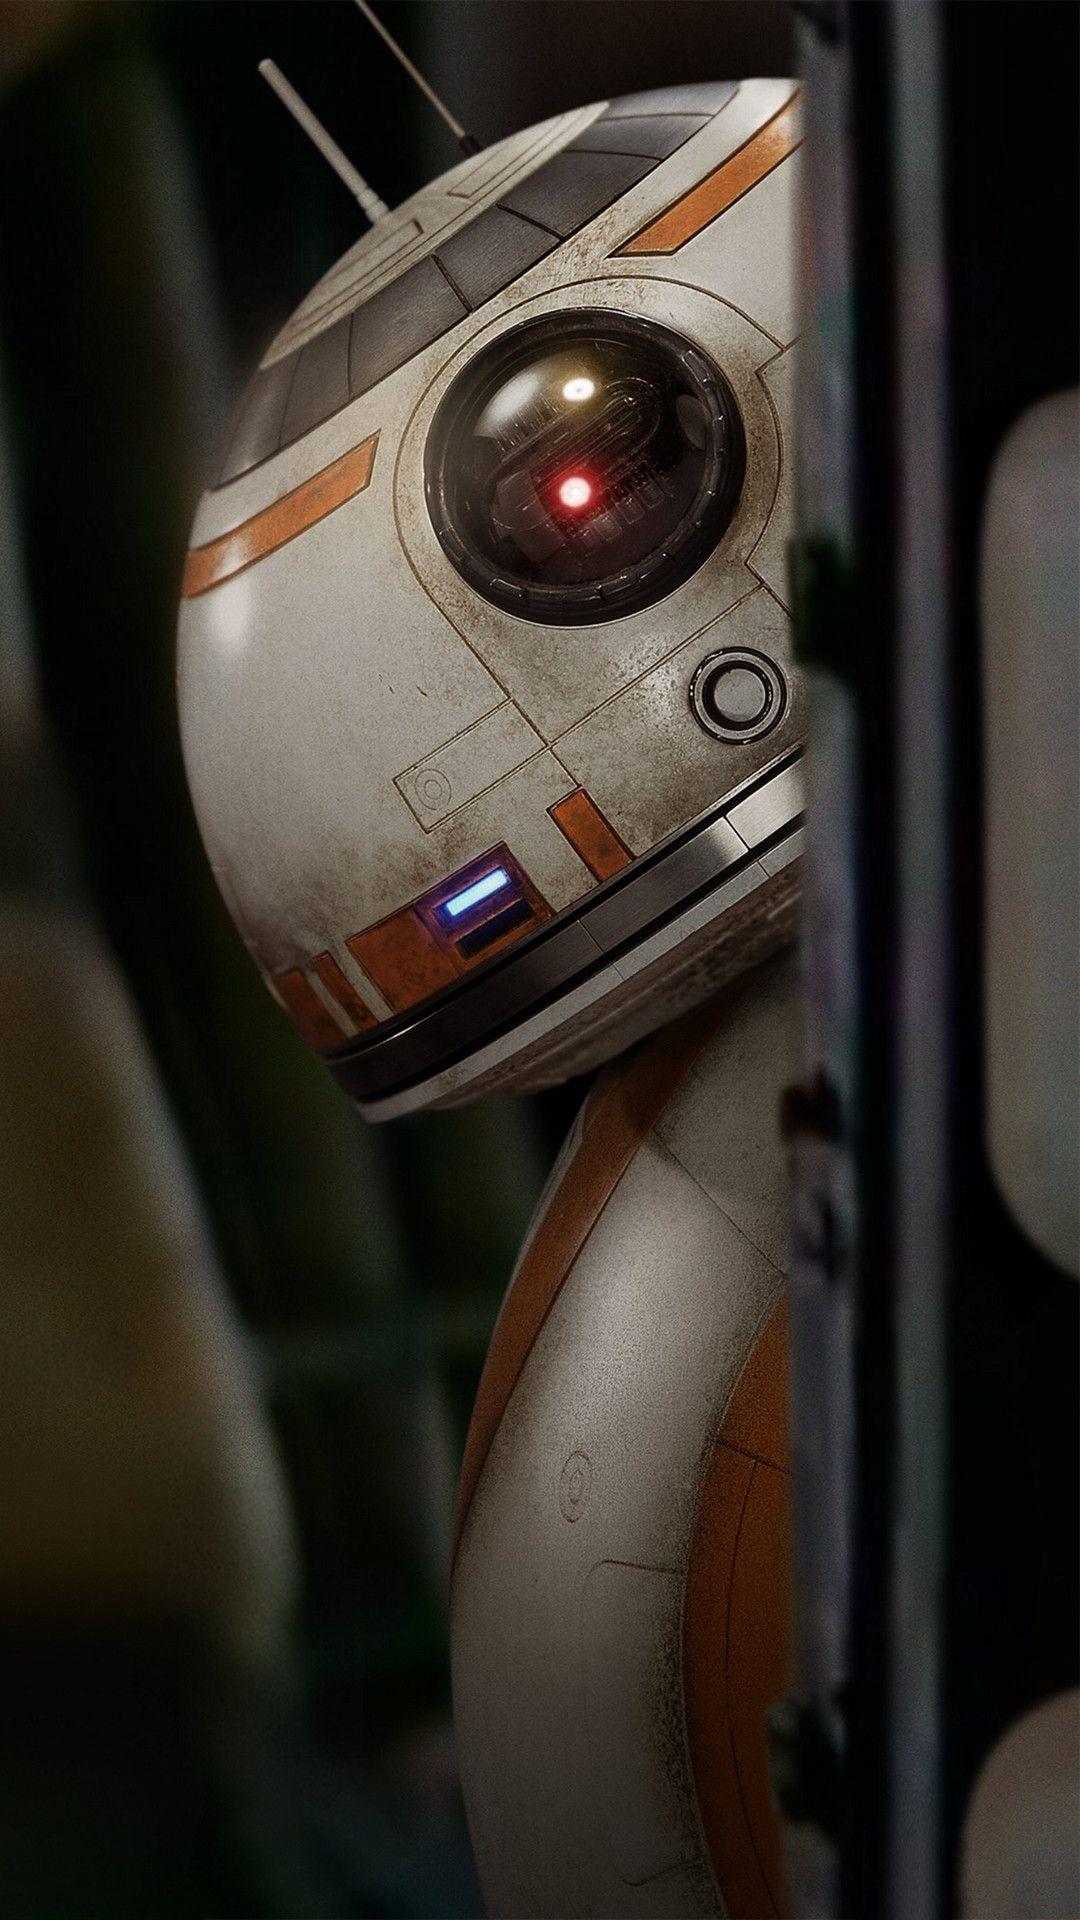 Pin by Chantal Malebranche on Star Wars in 2020 Star wars 1080x1920